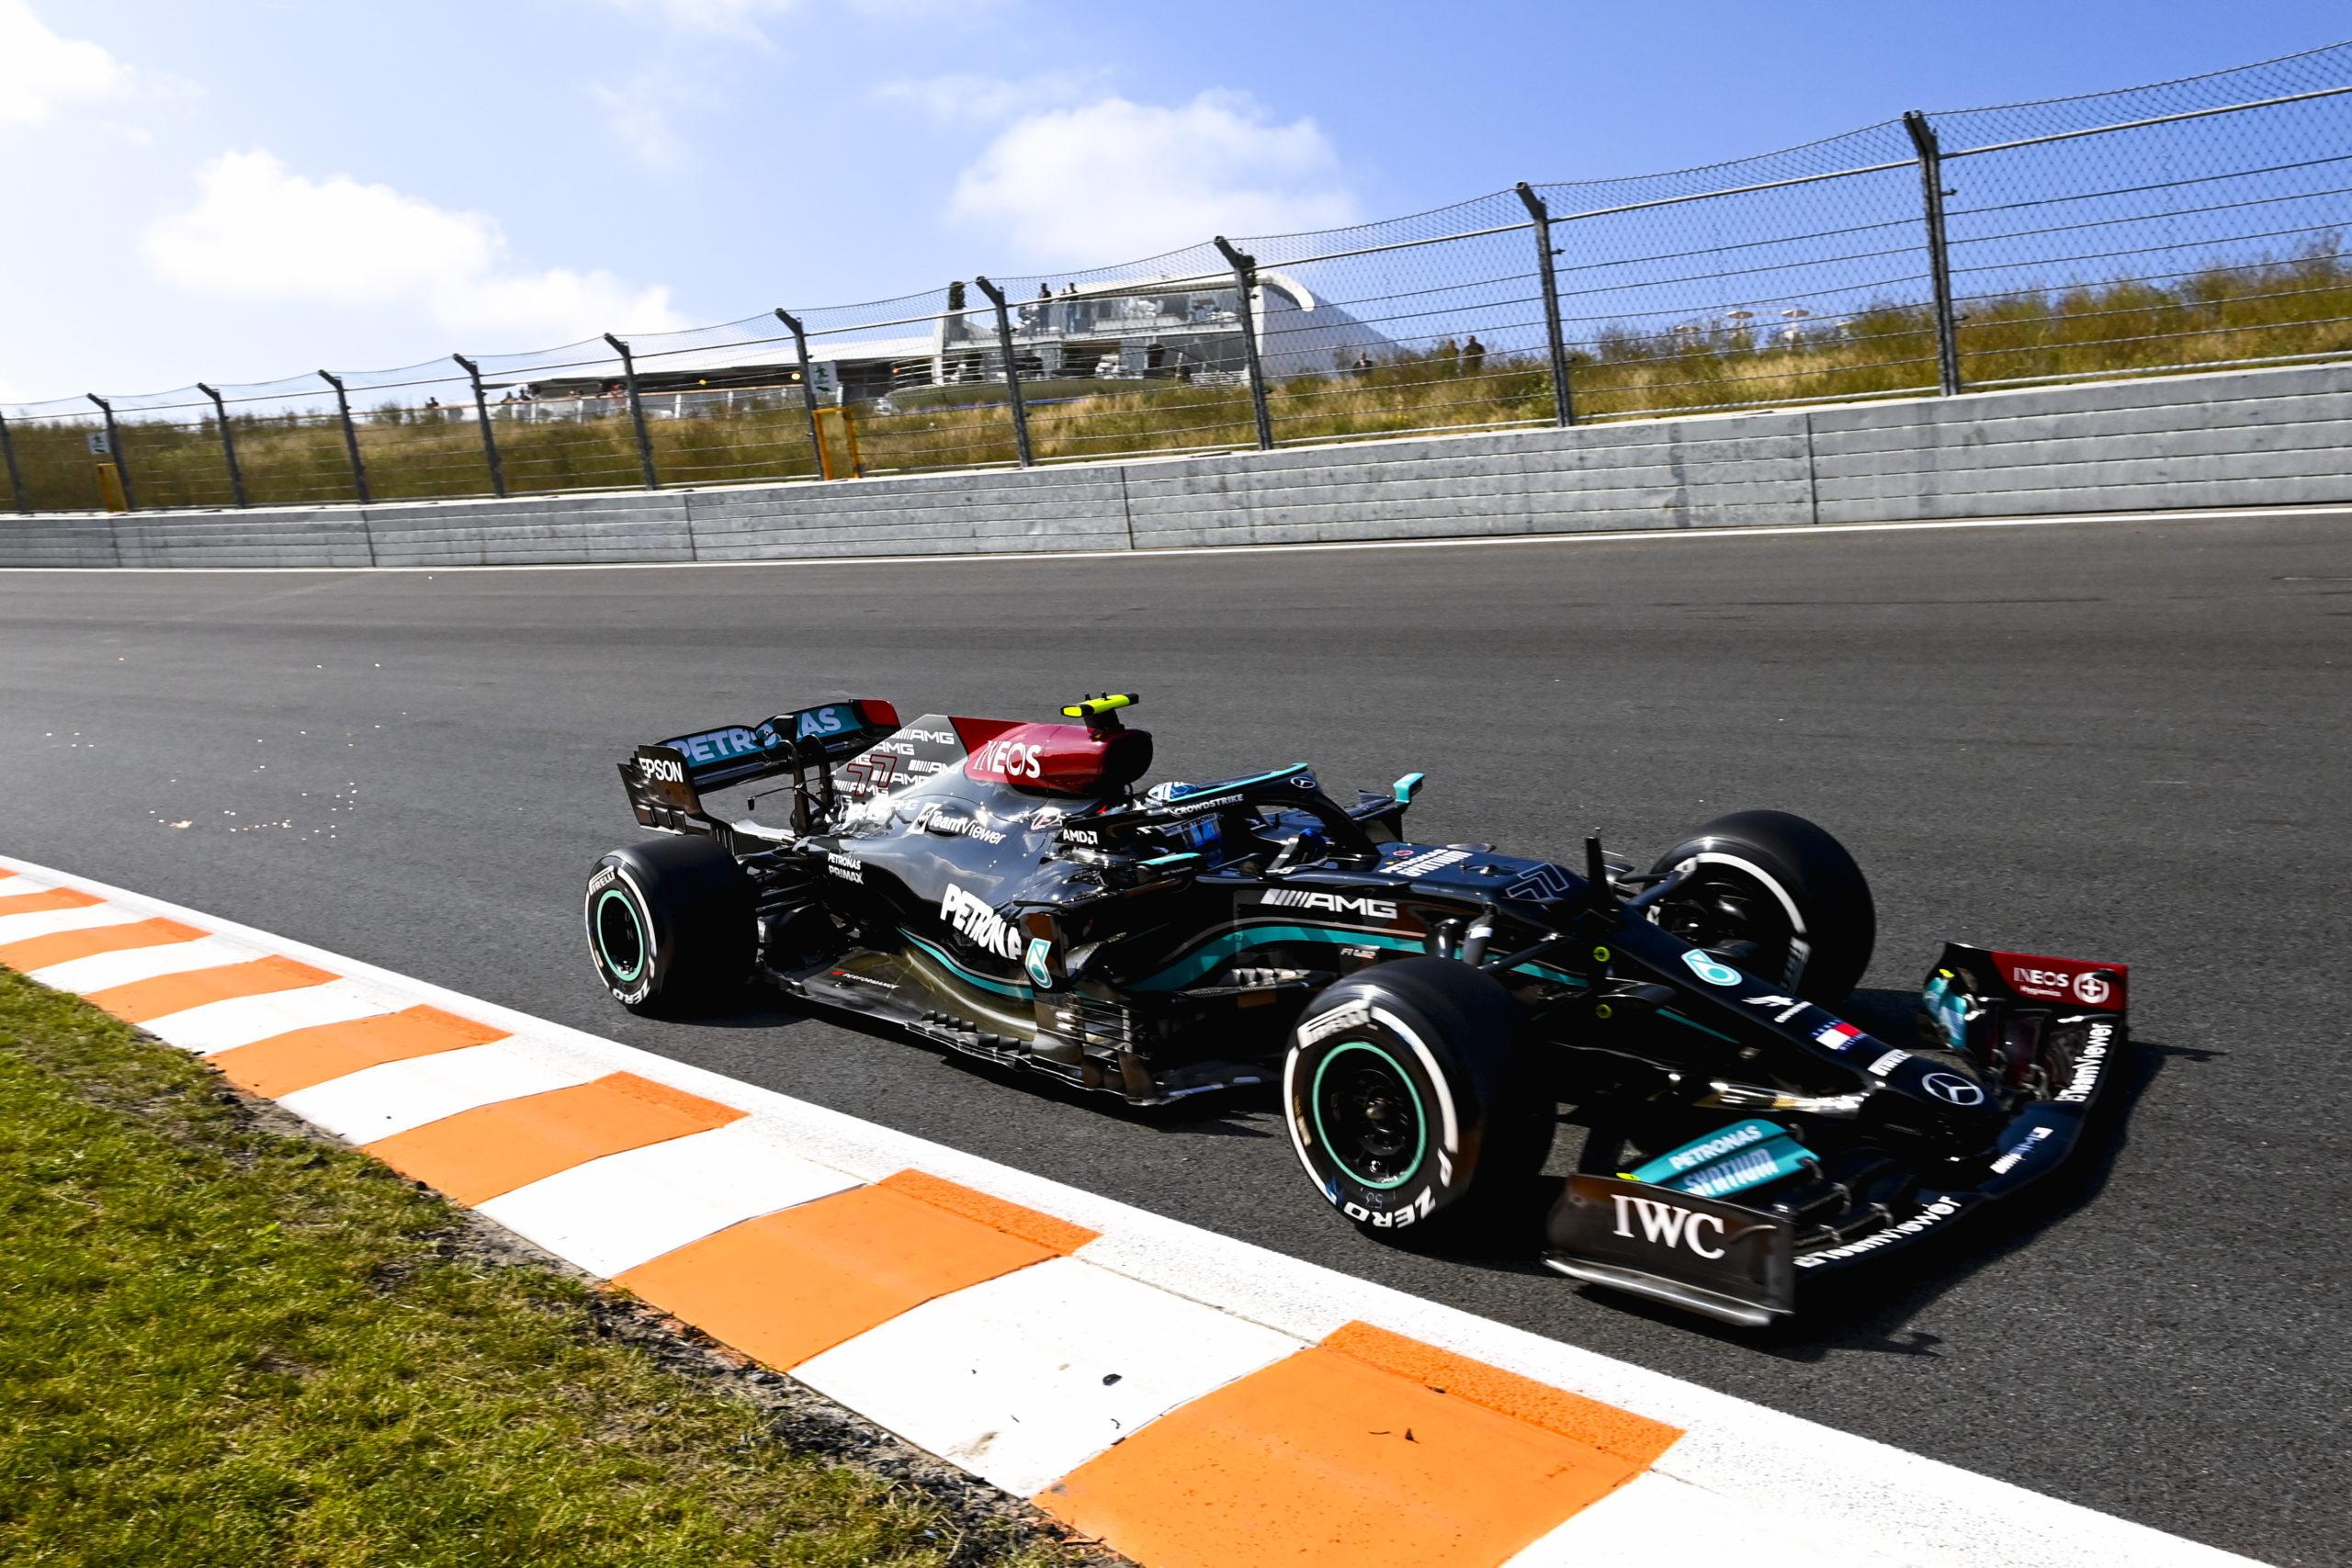 Valtteri Bottas, Mercedes, 2021 Dutch Grand Prix, Friday - LAT Images